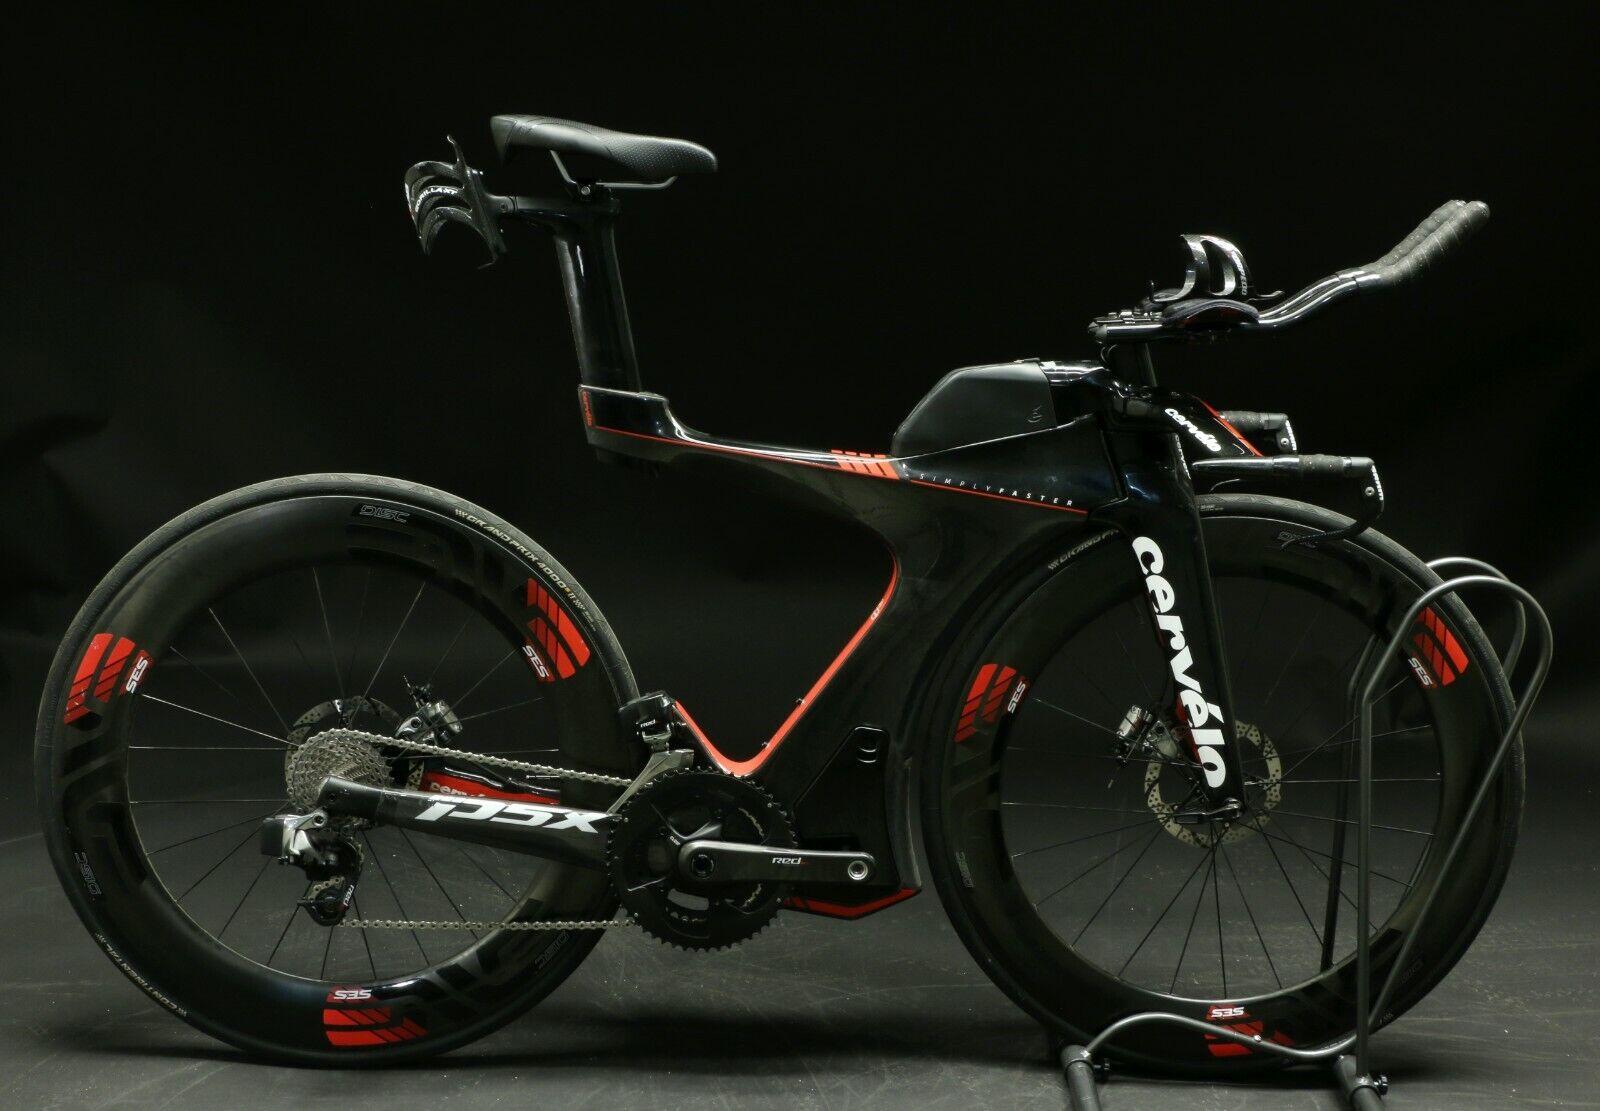 2018 Cervelo P5x Triathlon Bike Medium Carbon SRAM Red eTap ENVE SES Demo Model (Used - 8499.99 USD)